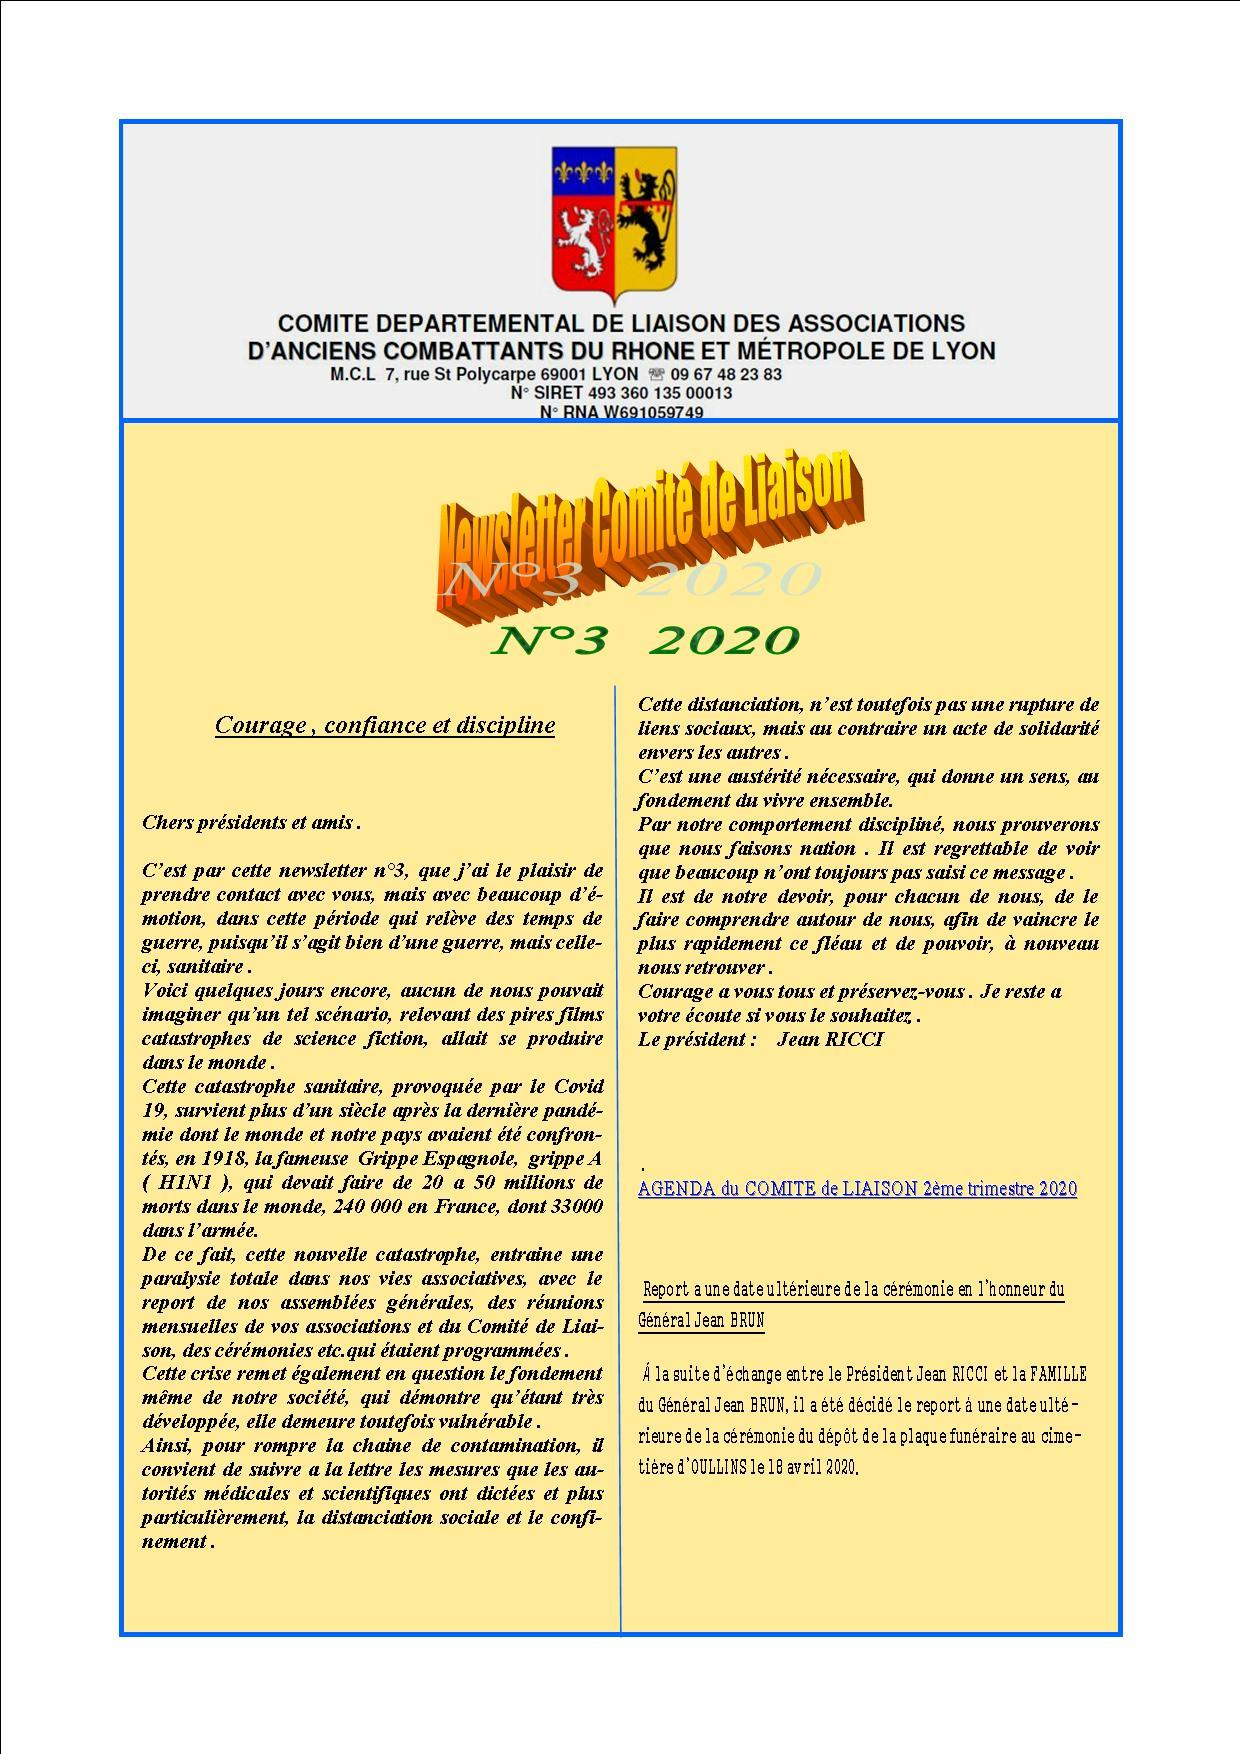 Newsletter comite de liaisonn 3 2020